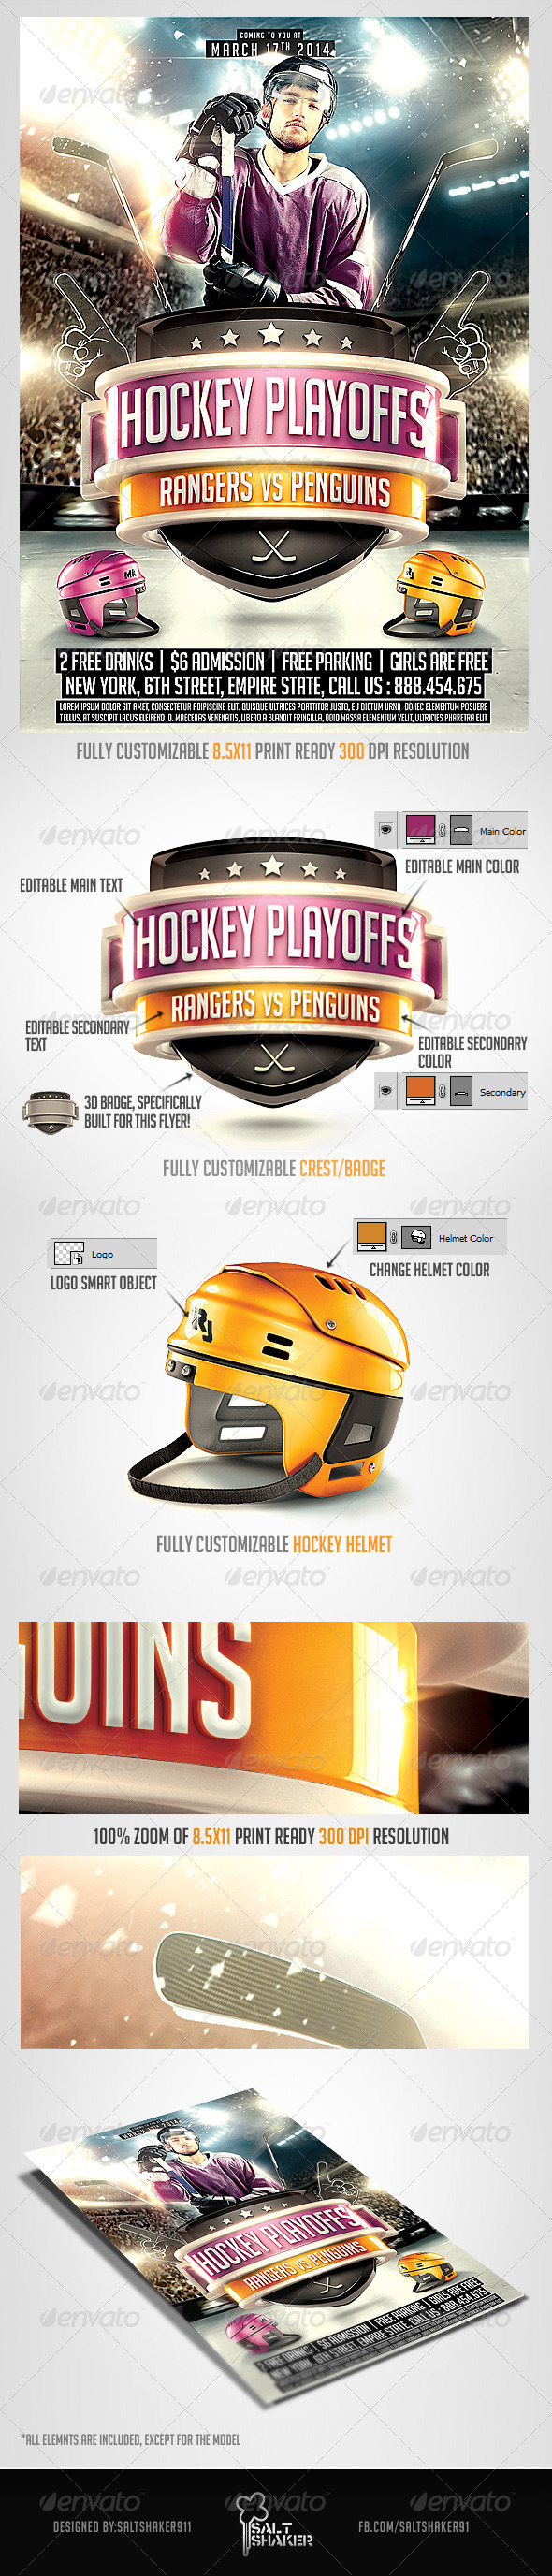 GraphicRiver Hockey Playoffs Flyer template 7167664